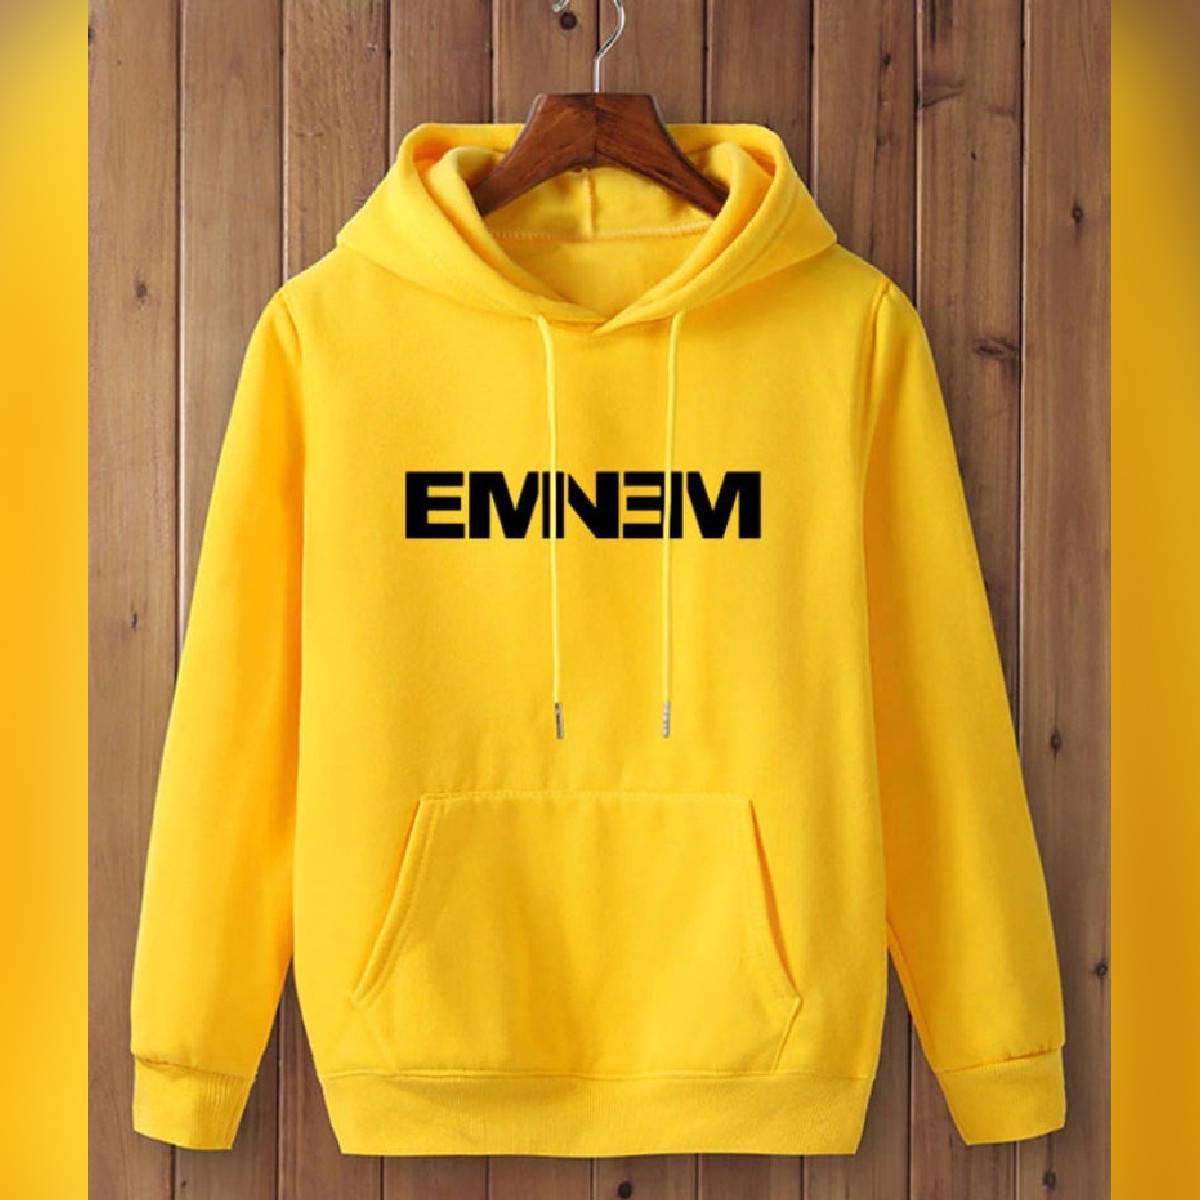 Eminem Print Pullover Hooded Hoodie for men